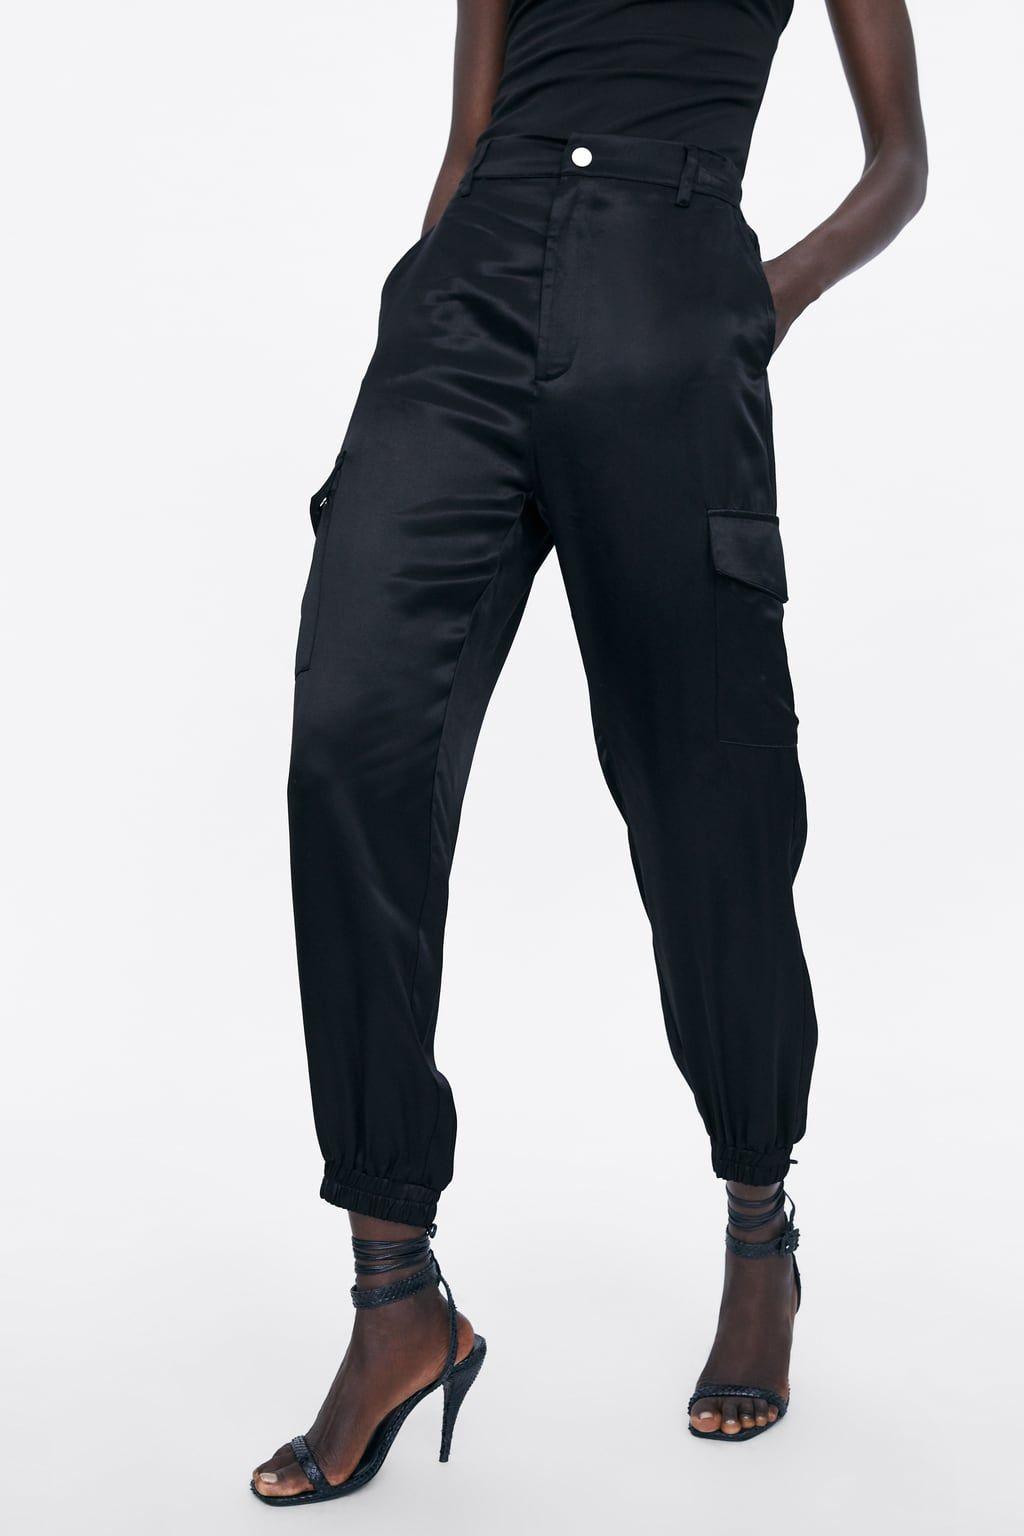 pantalon cargo femme noir zara